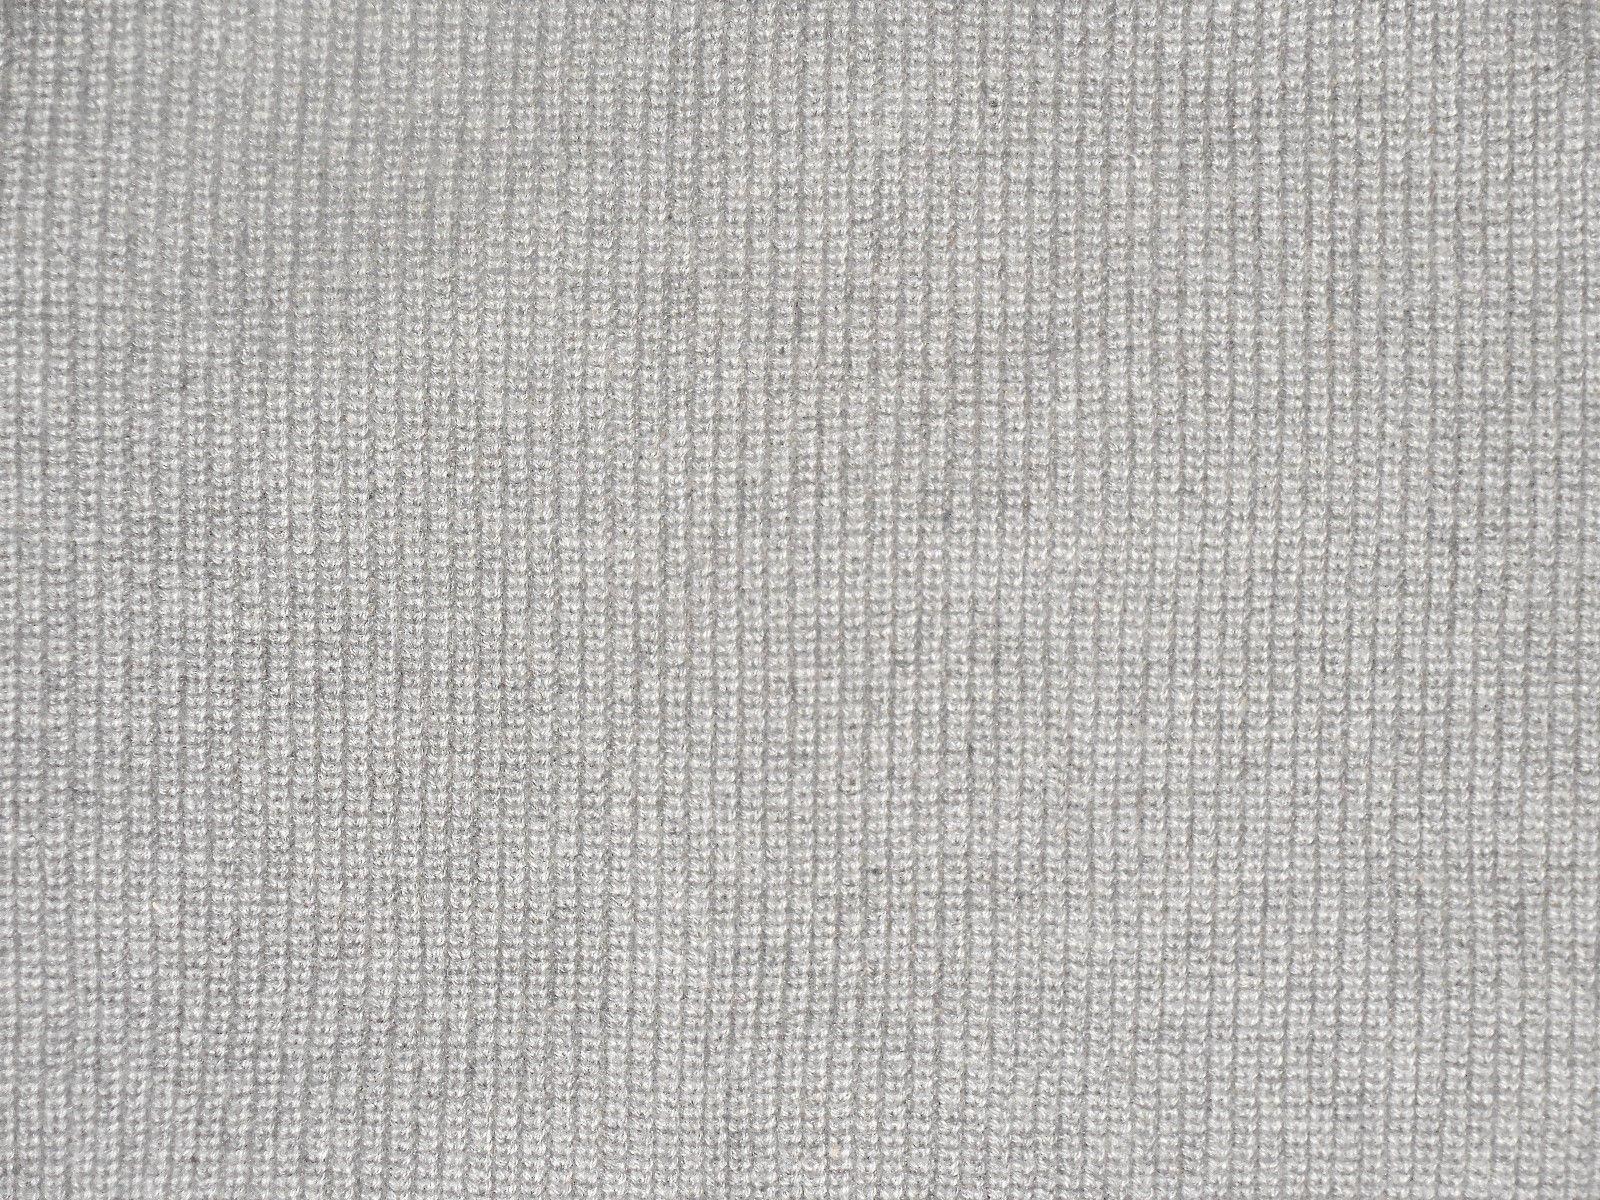 Tommy Hilfiger M Gray Knit V-Neck 100% Cotton Pullover Sleeveless Sweater Vest image 10